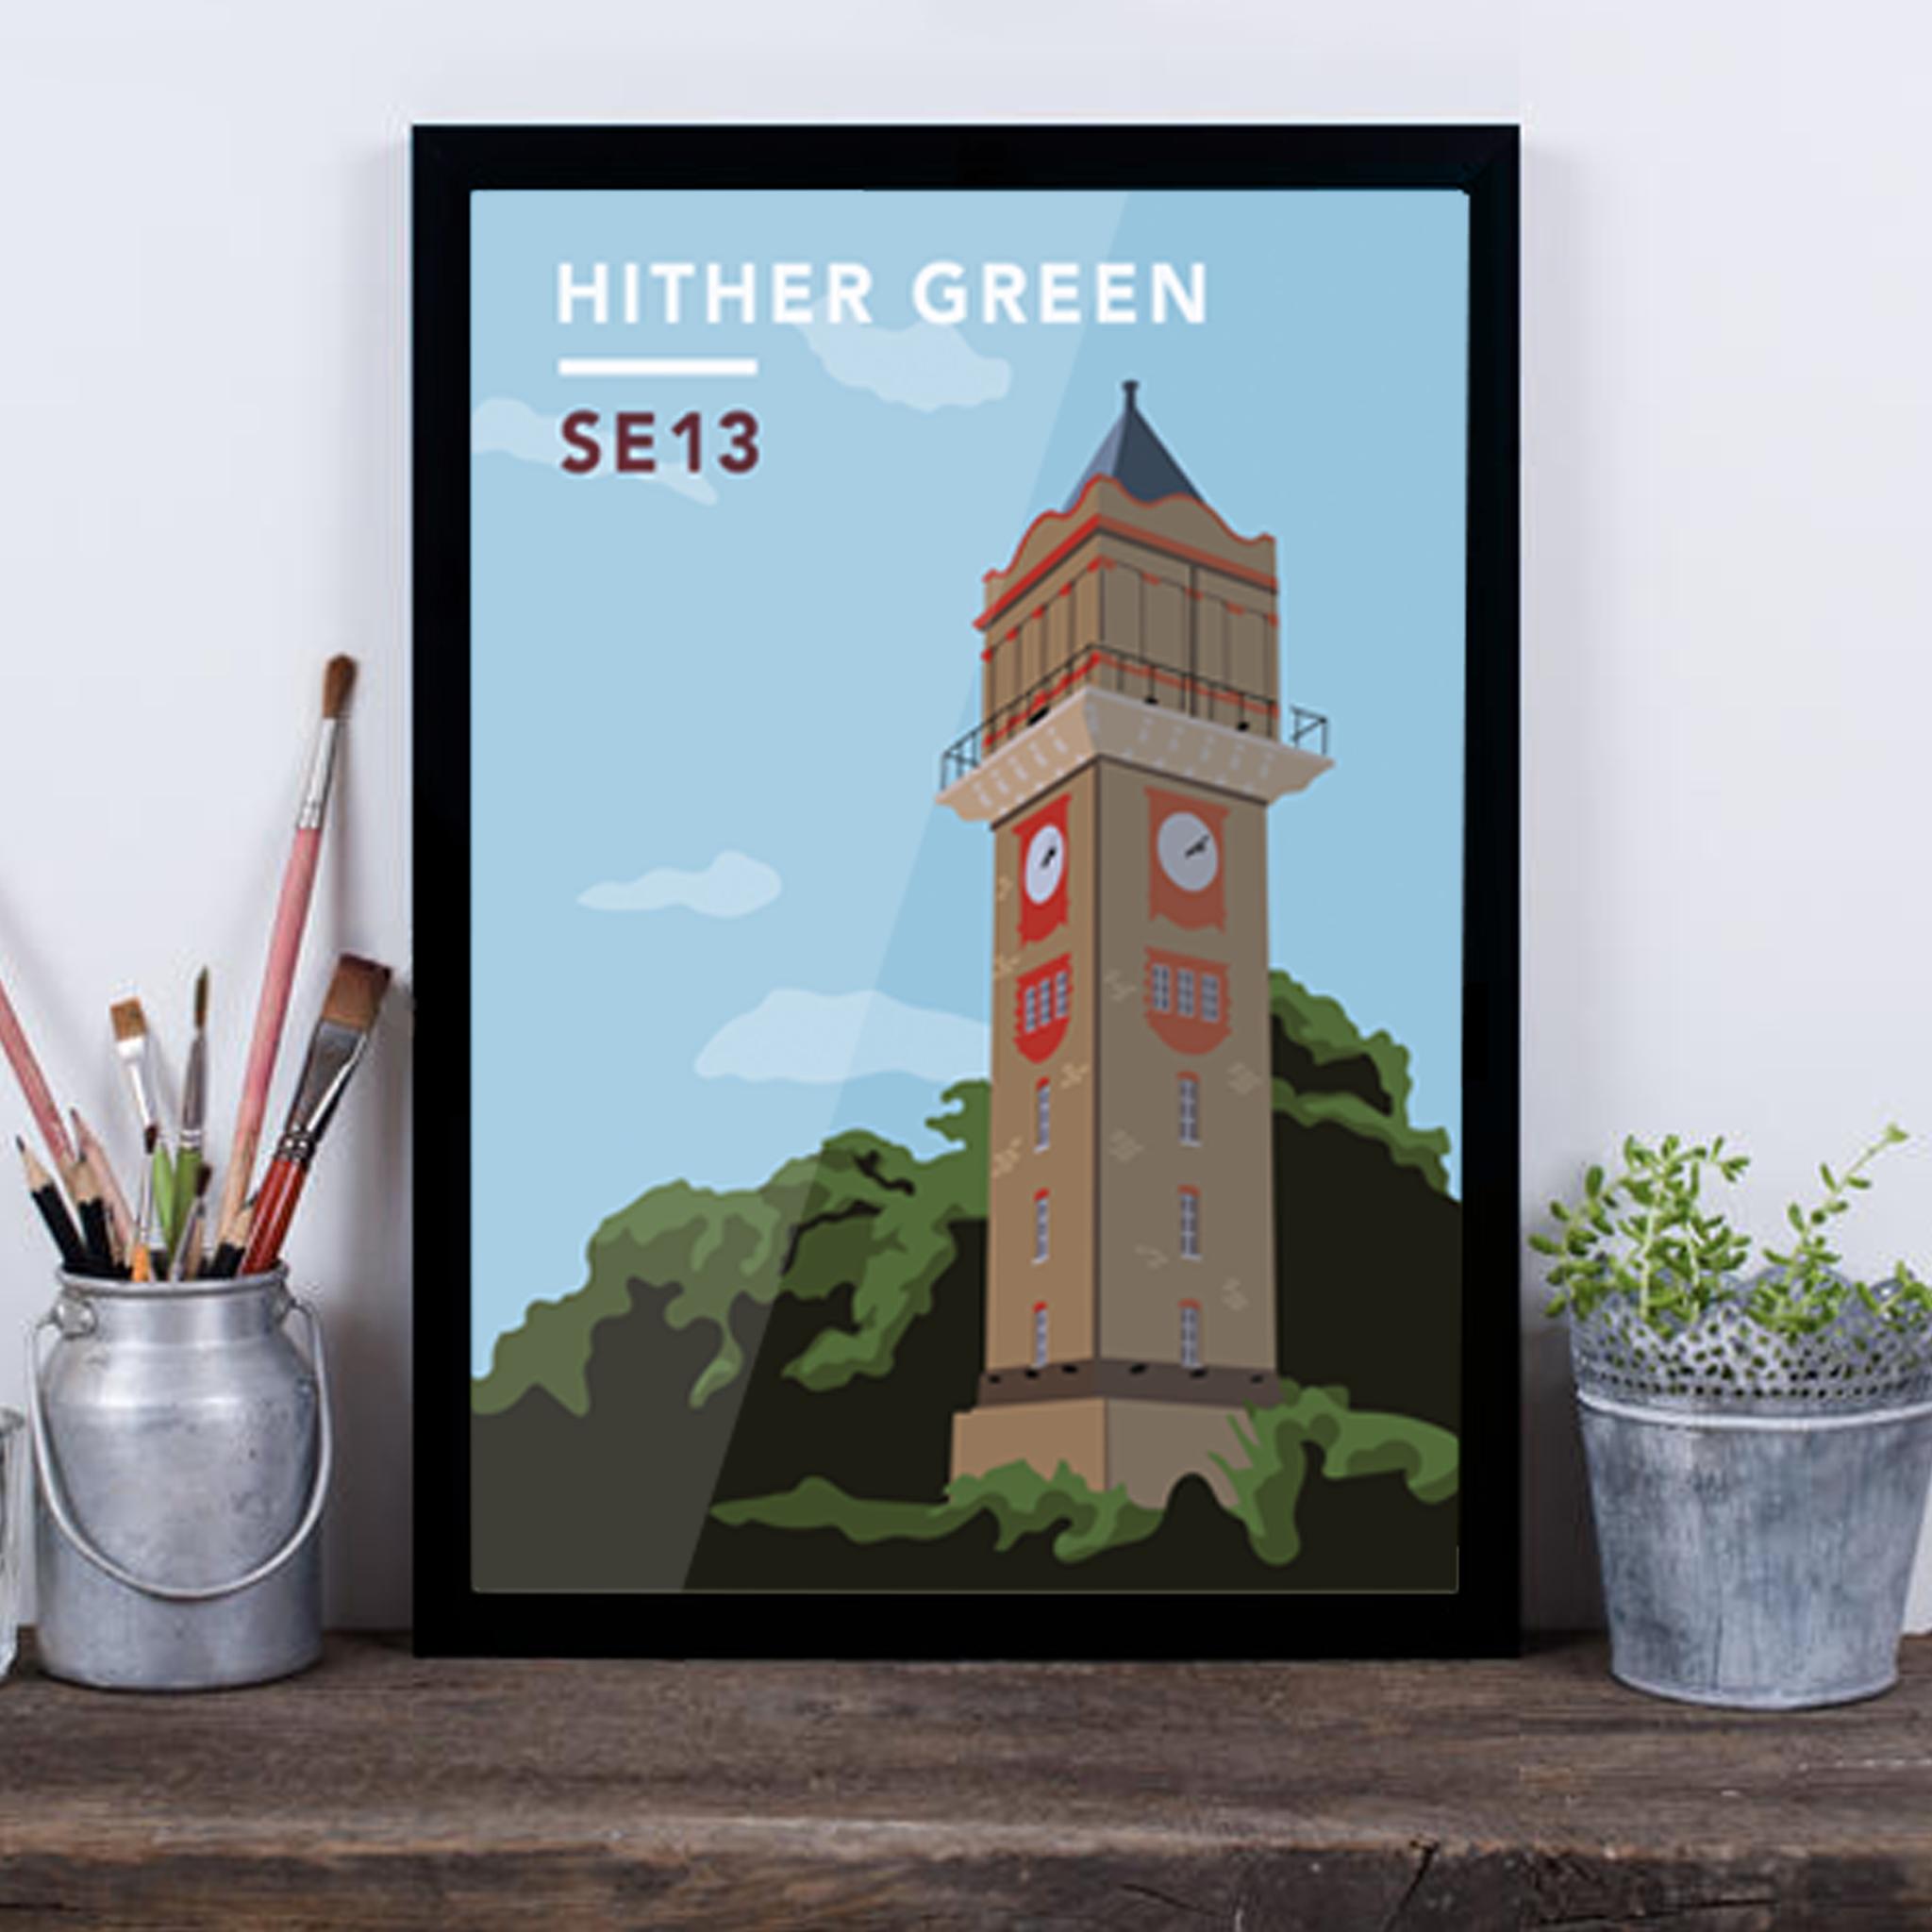 Hither Green Water Tower SE13 - Giclée Art Print -